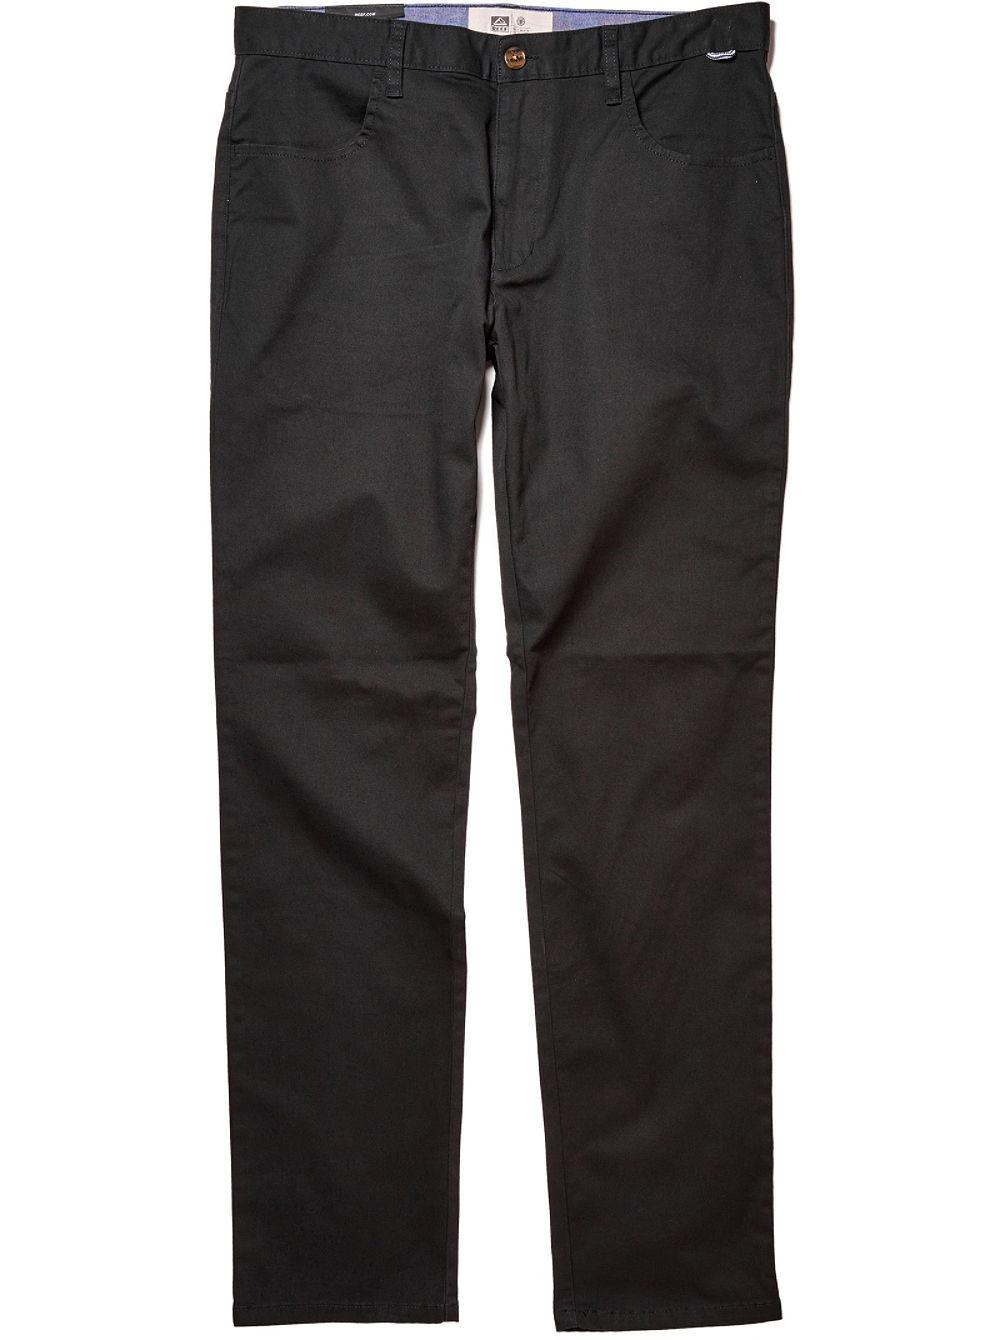 reef-auto-redial-pants